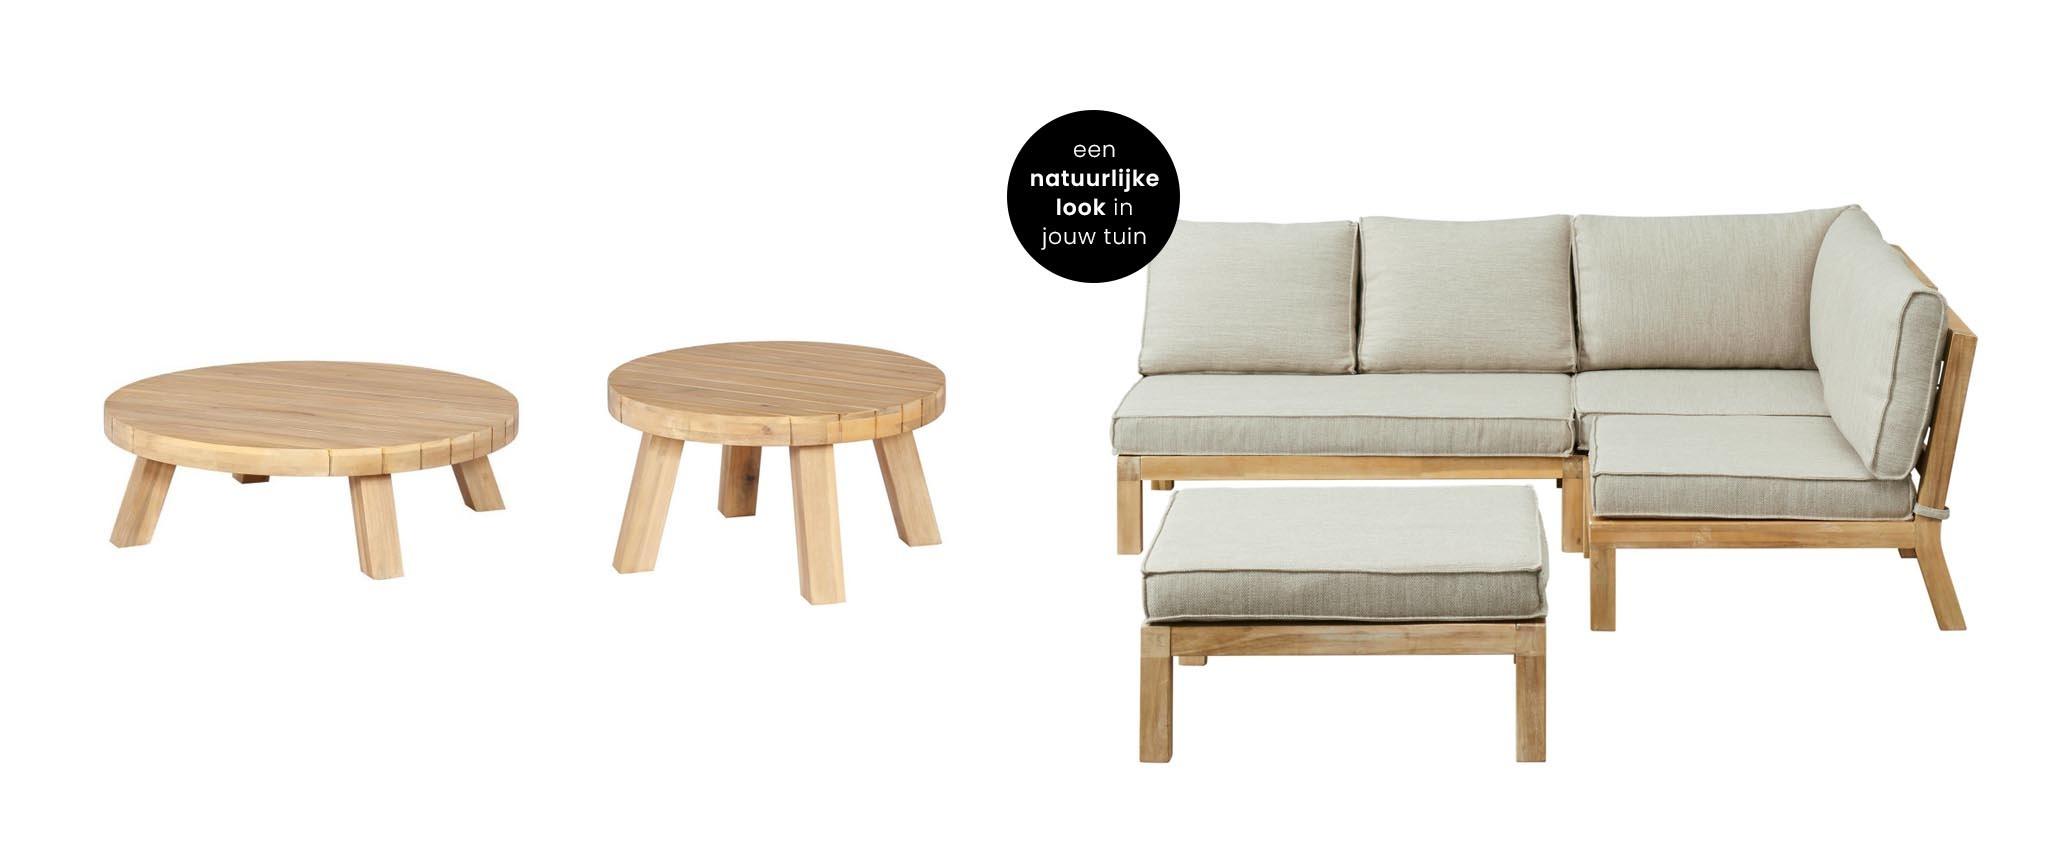 Kent loungeset hout